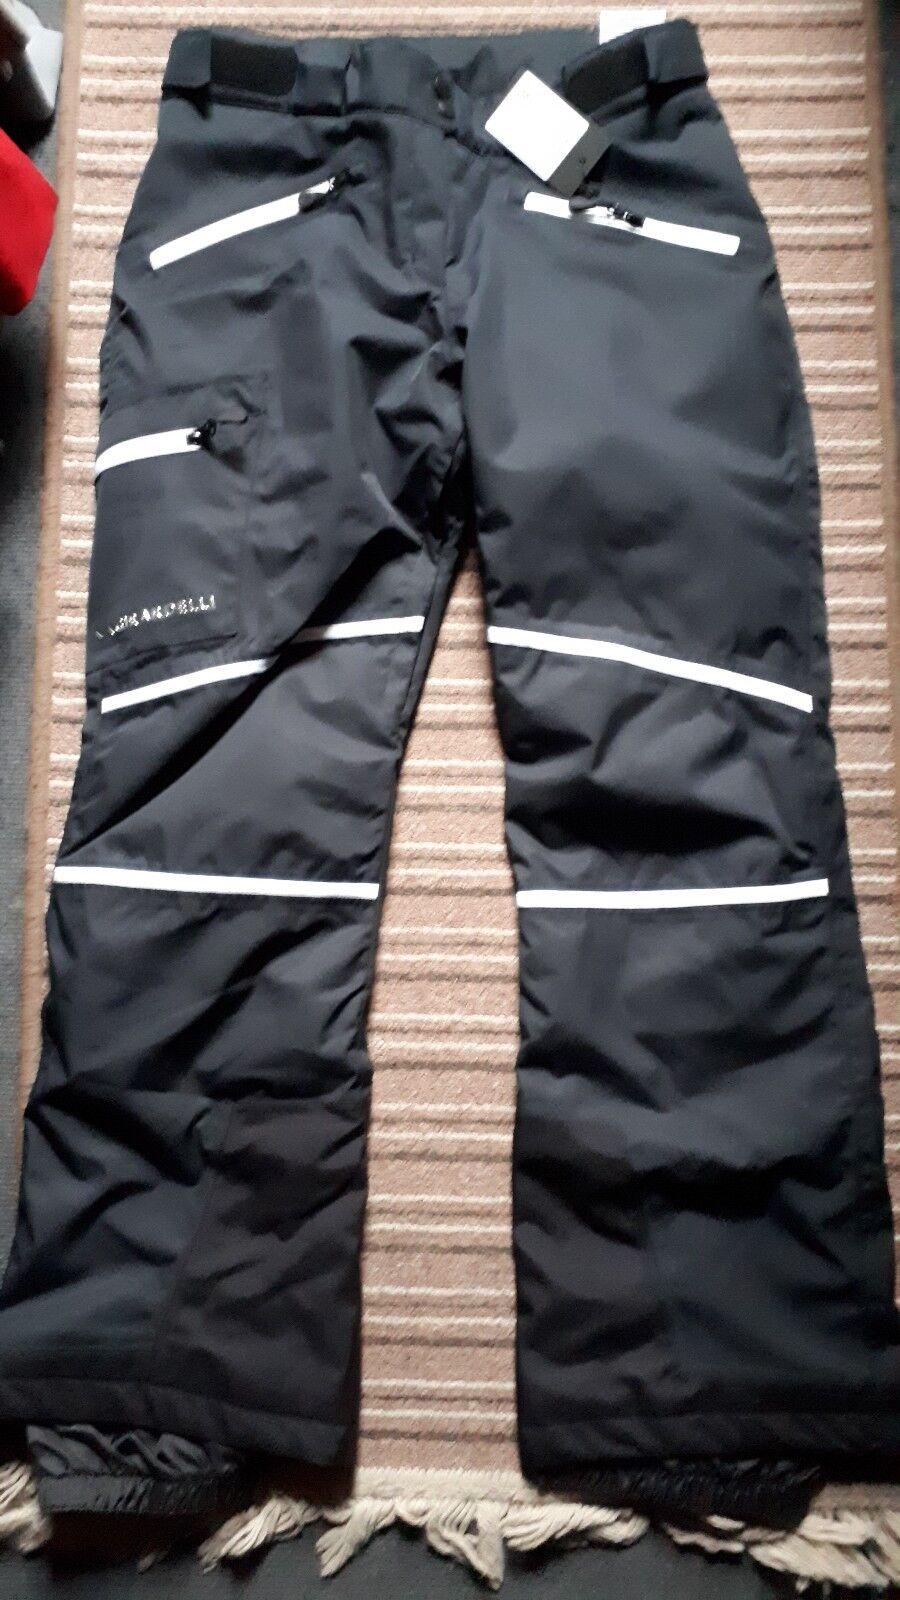 Patagonia Damen Damen Nano Quaste Isolierte Jacke UK 12 Black Bergsteigen & Klettern